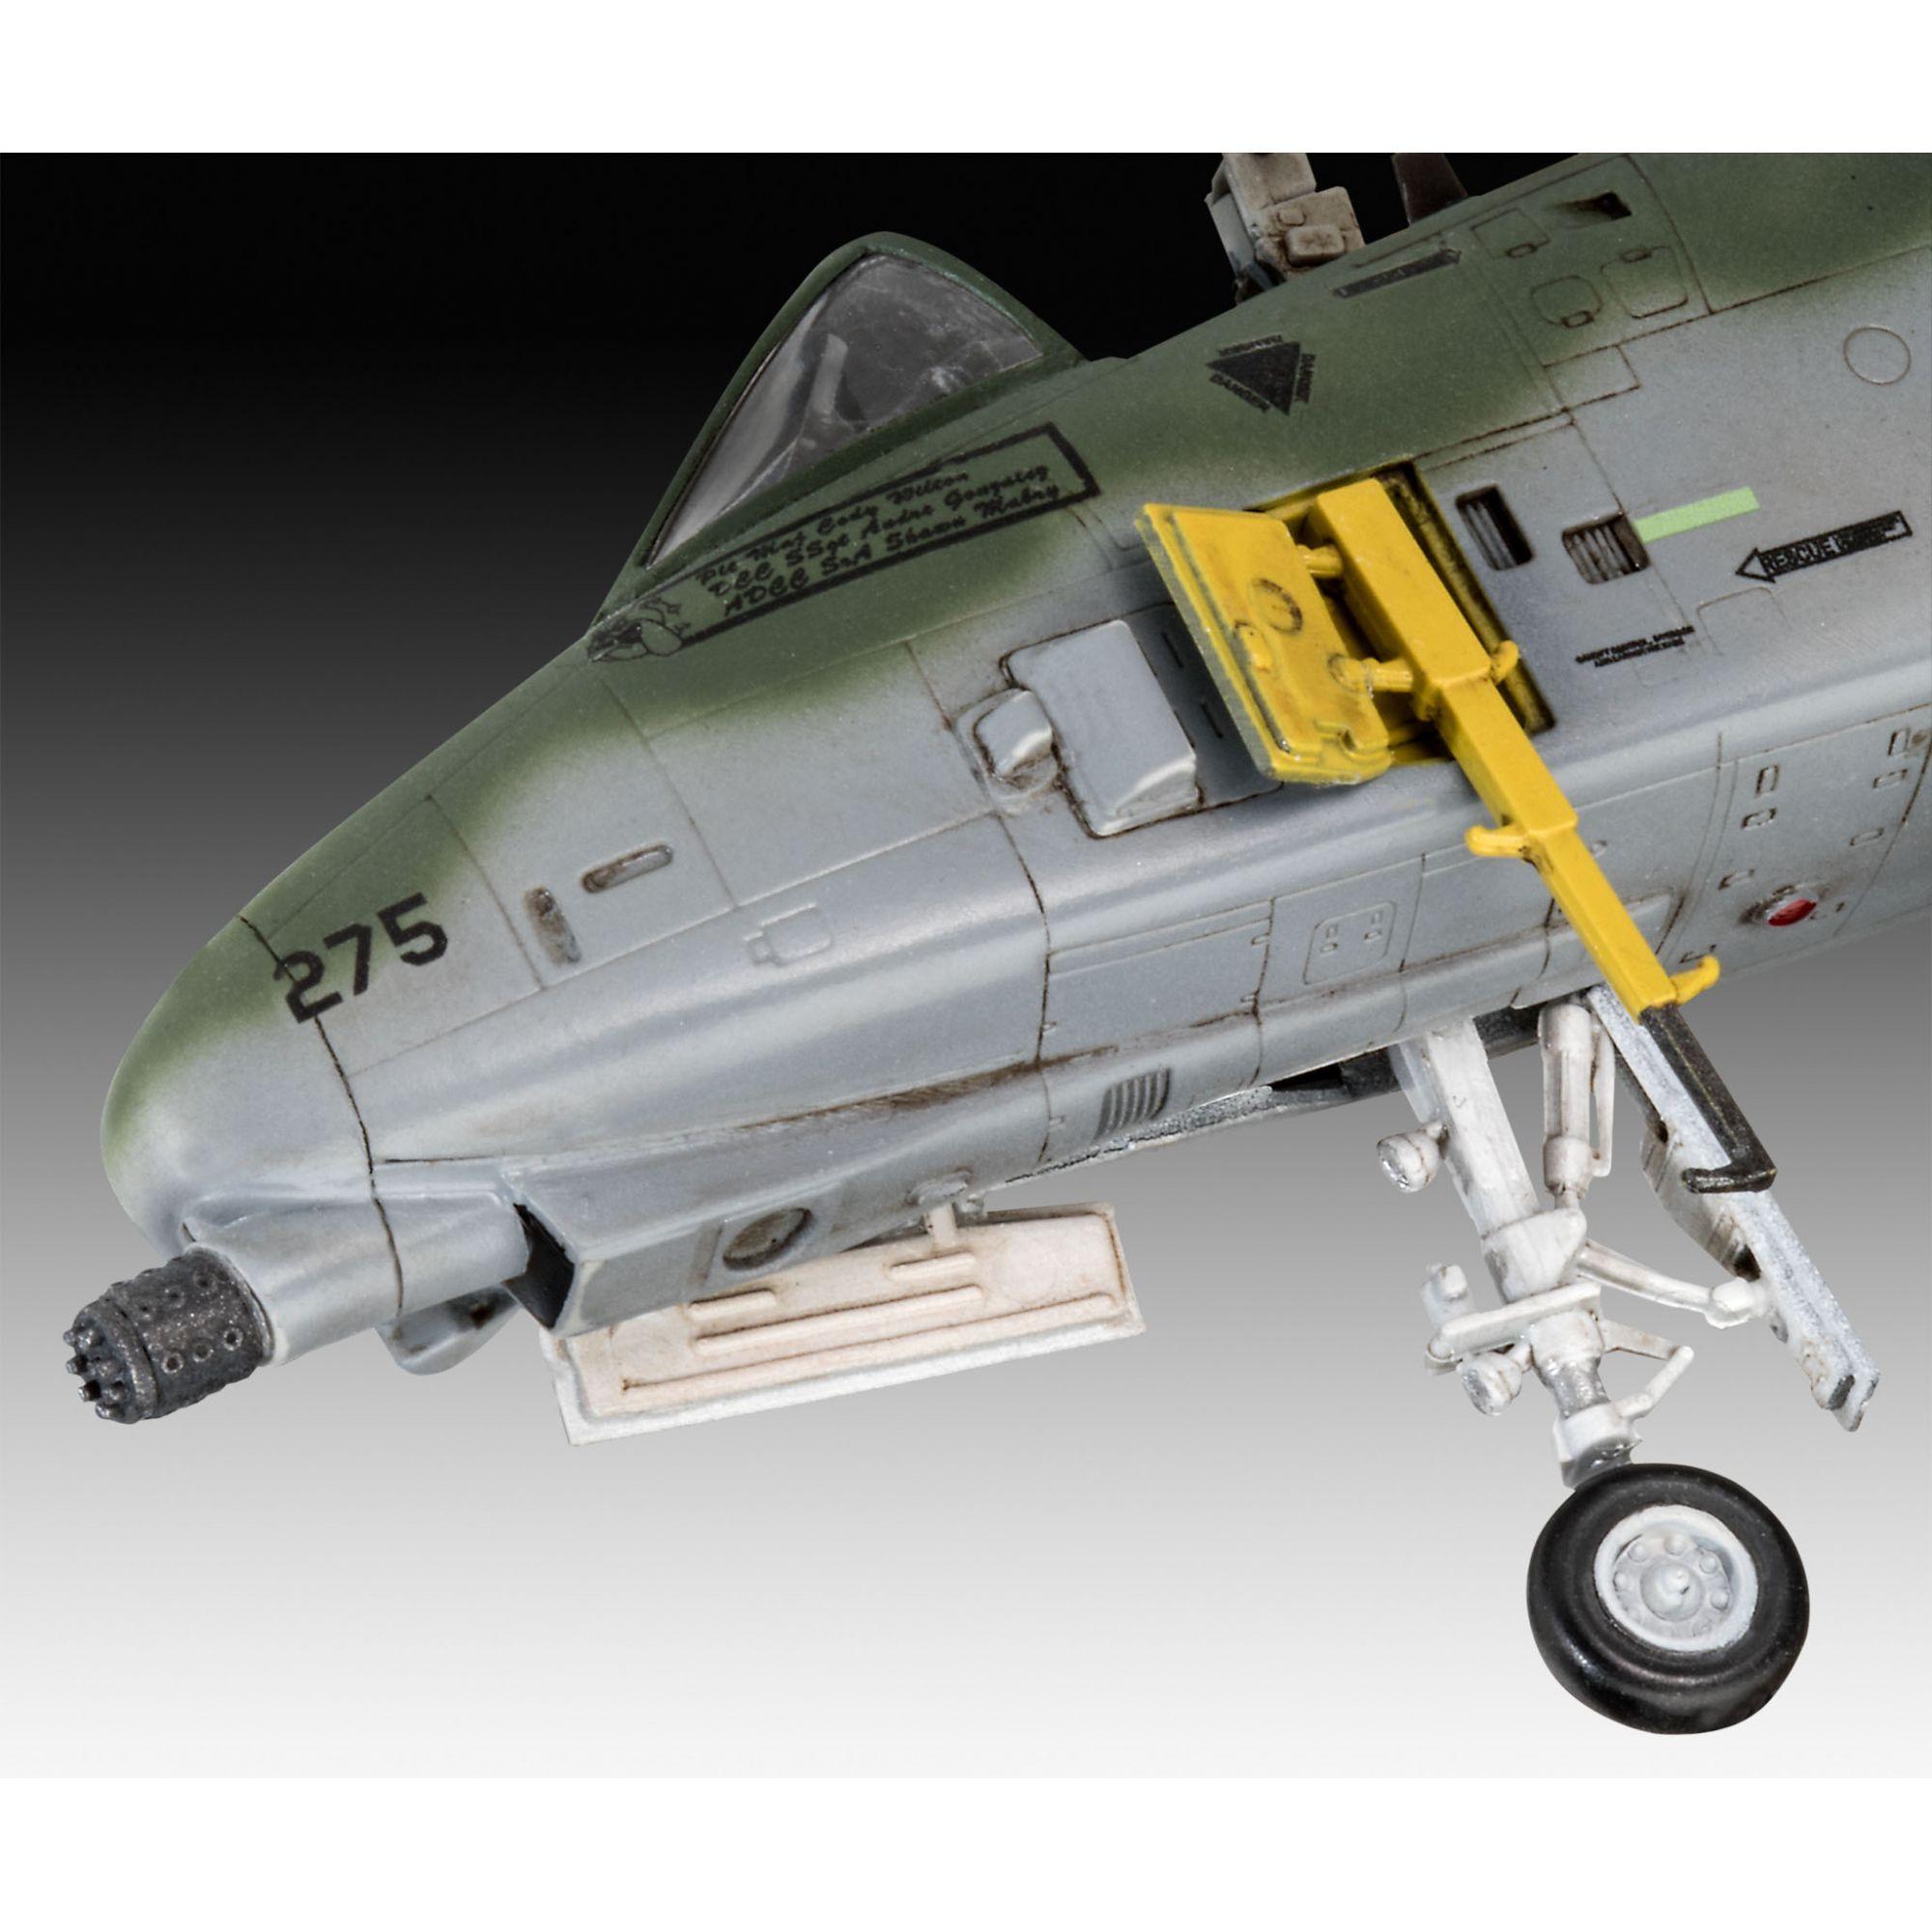 A-10 C Thunderbolt II - 1/72 - Revell 03857  - BLIMPS COMÉRCIO ELETRÔNICO